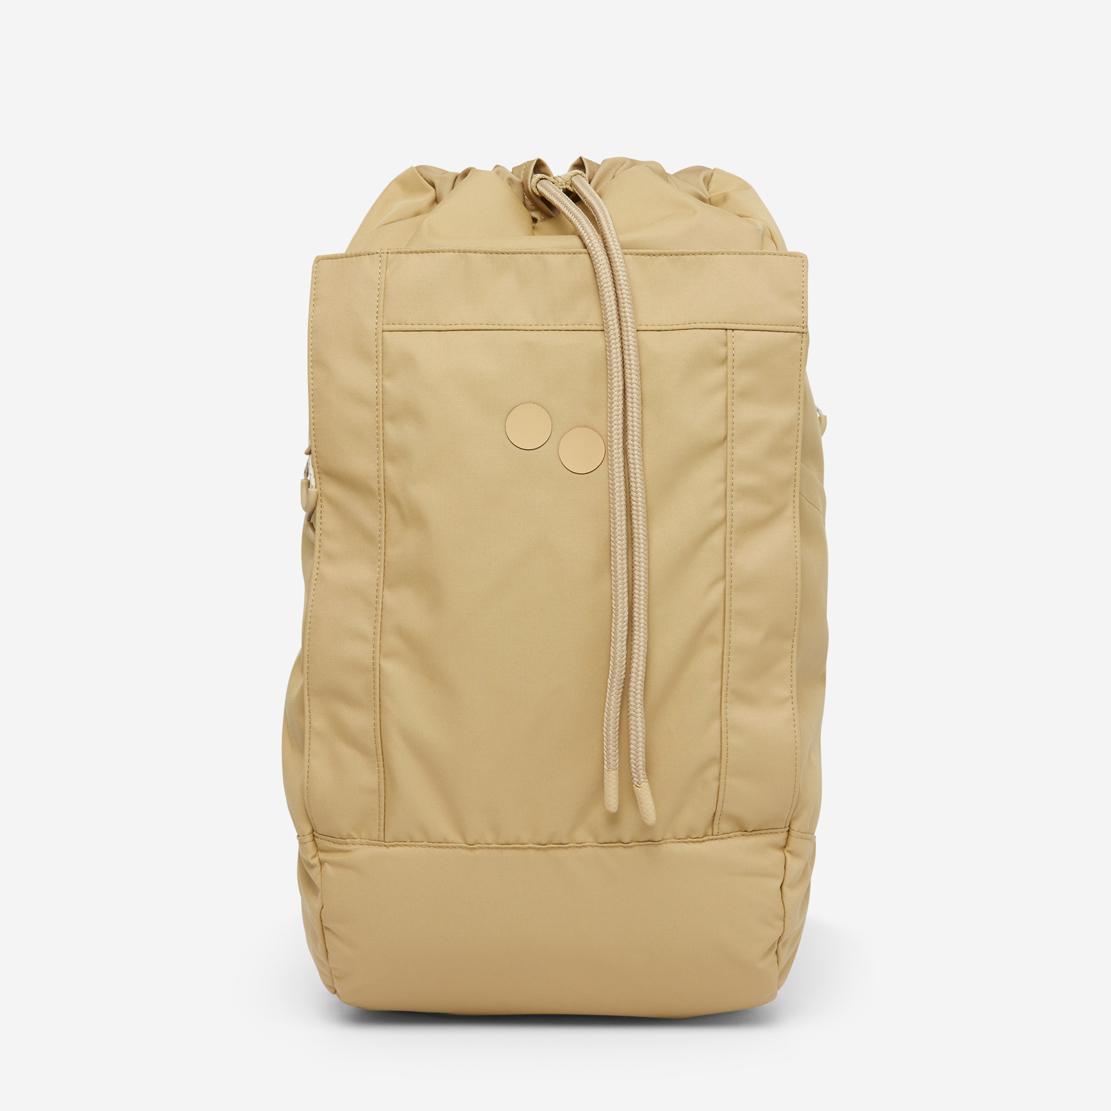 Kalm Rye Khaki Pinqponq 30L ryggsäck